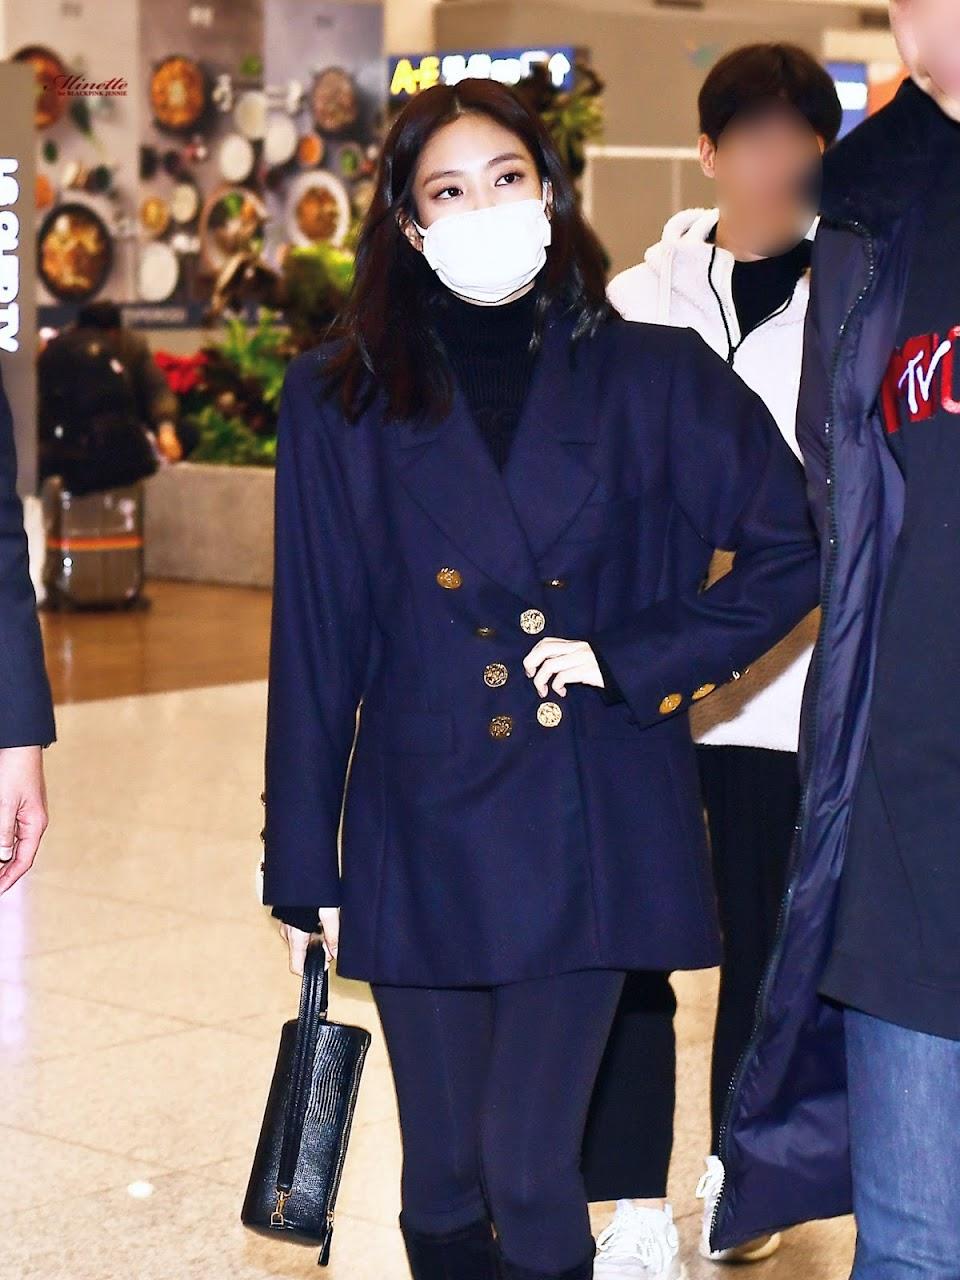 blackpink jennie airport fashion 2019 8